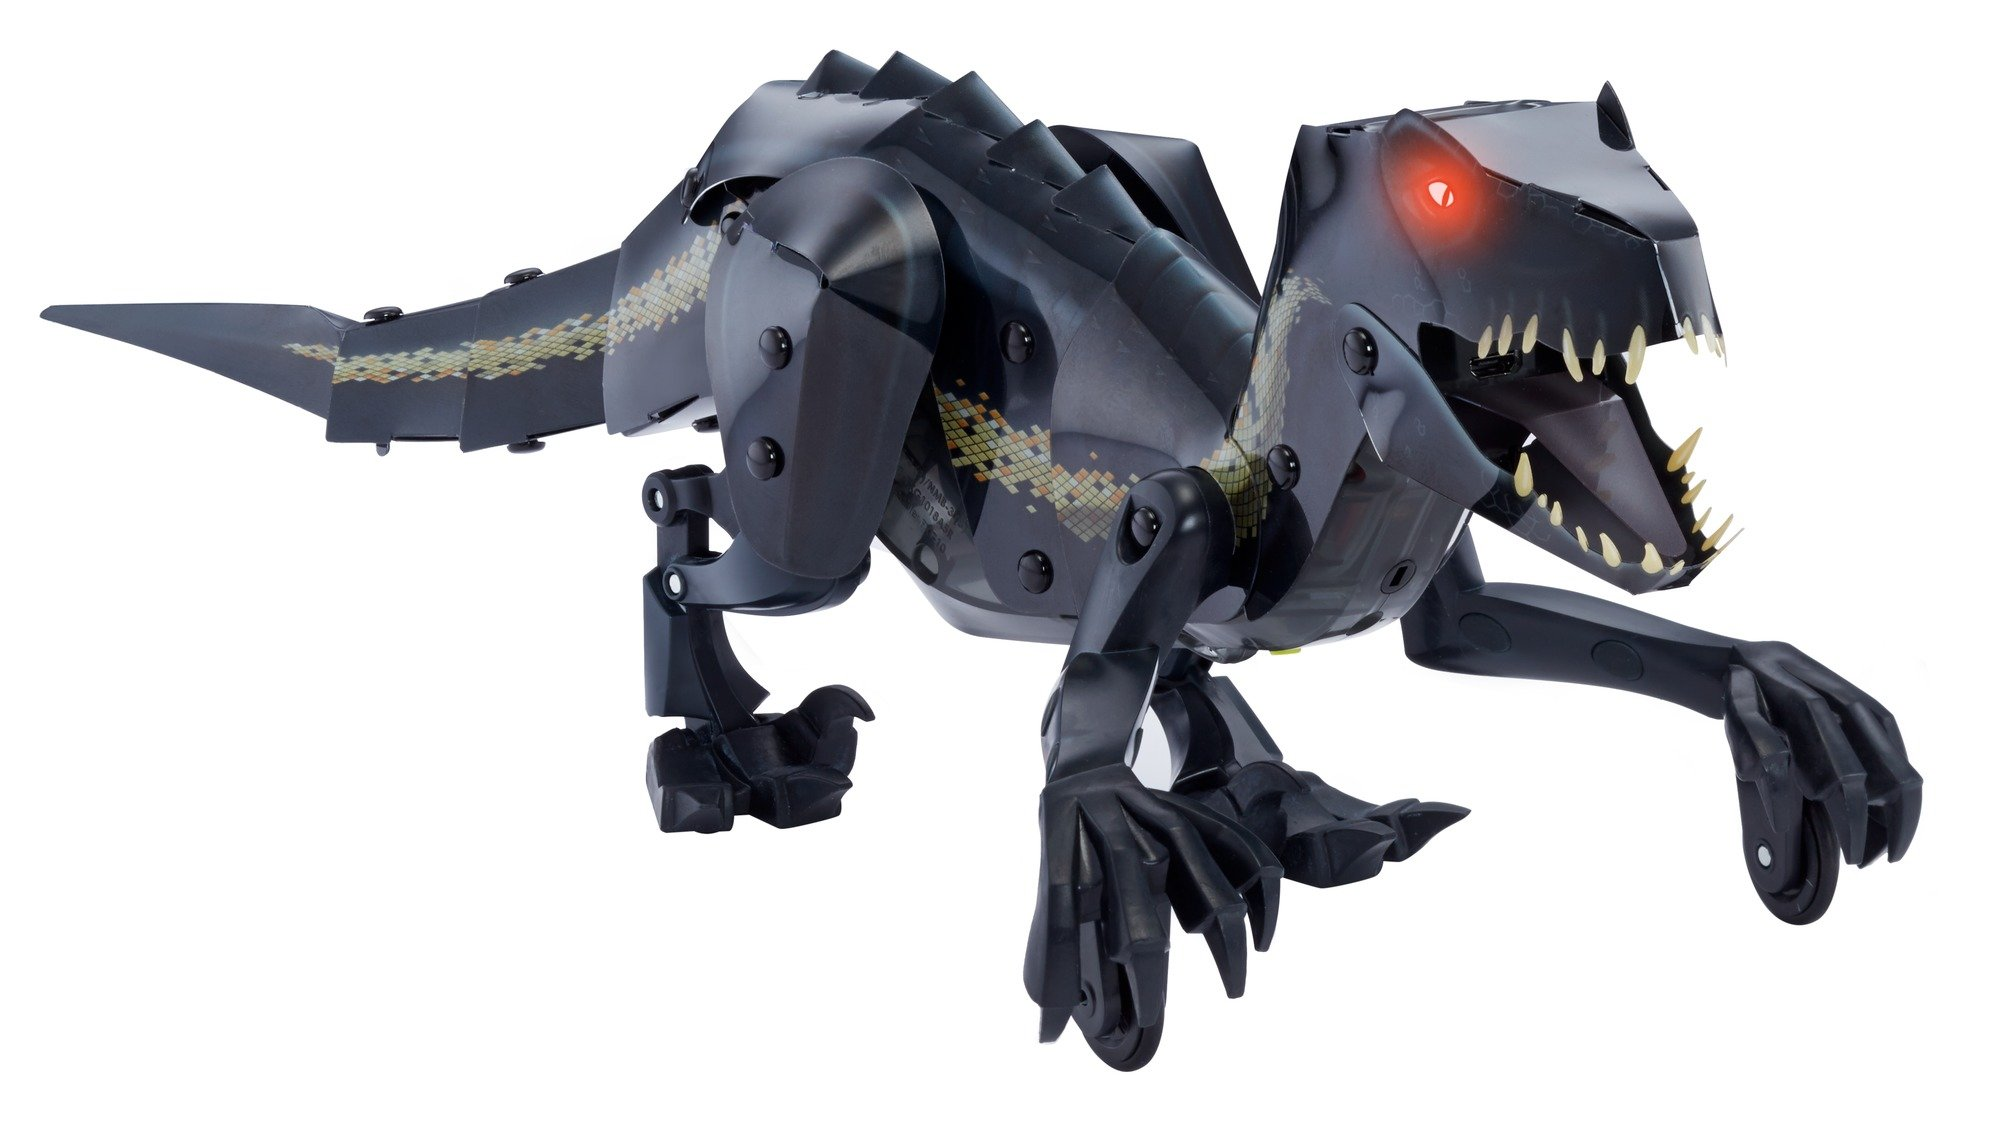 Kamigami Jurassic World Indoraptor Robot by Jurassic World Toys (Image #9)